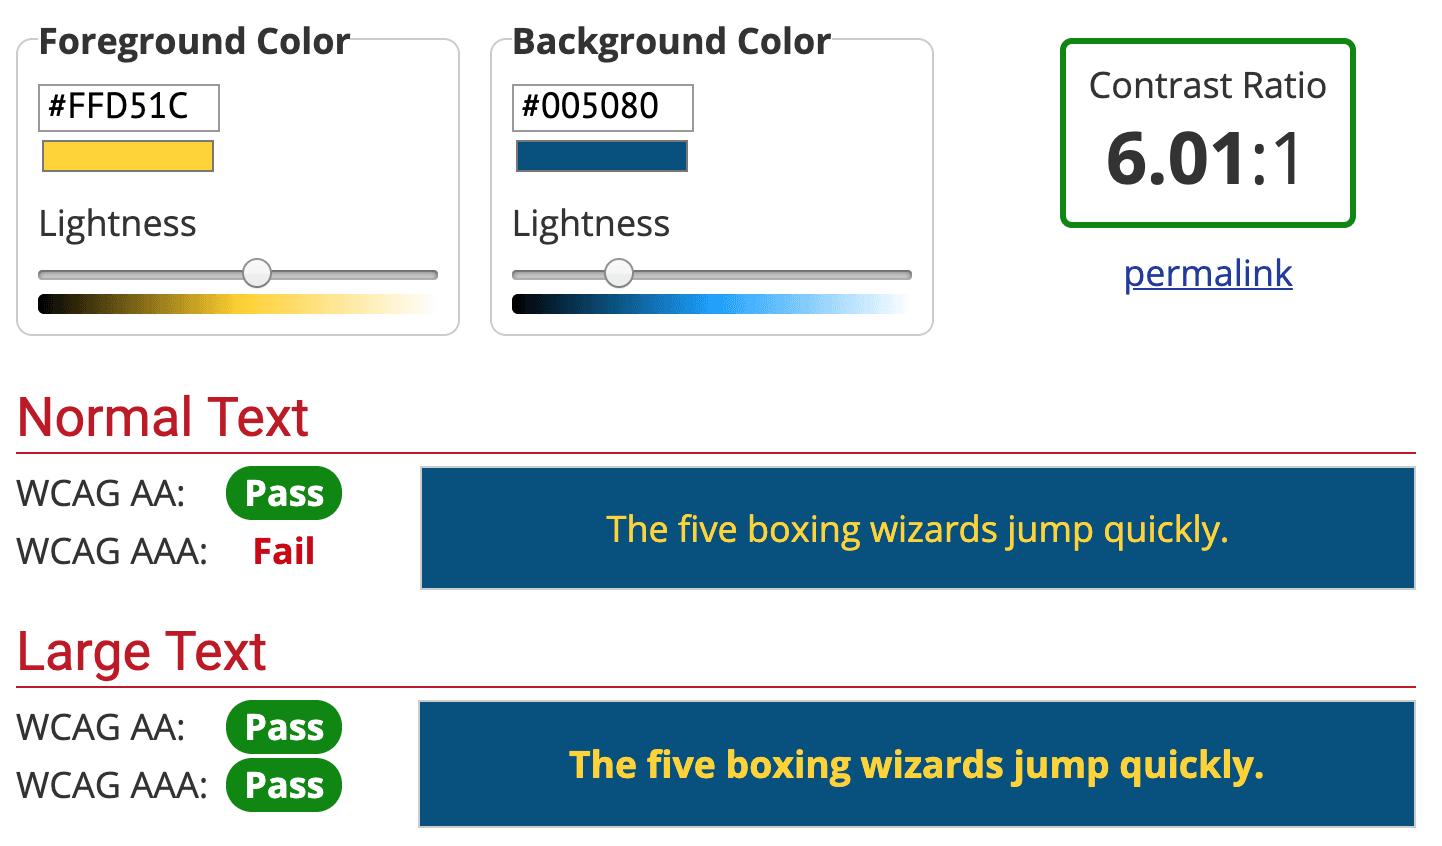 Vedfolnir Logo Color Contrast Checker 色彩學:高可讀性配色對比度檢查,杜絕門牌顏色之亂